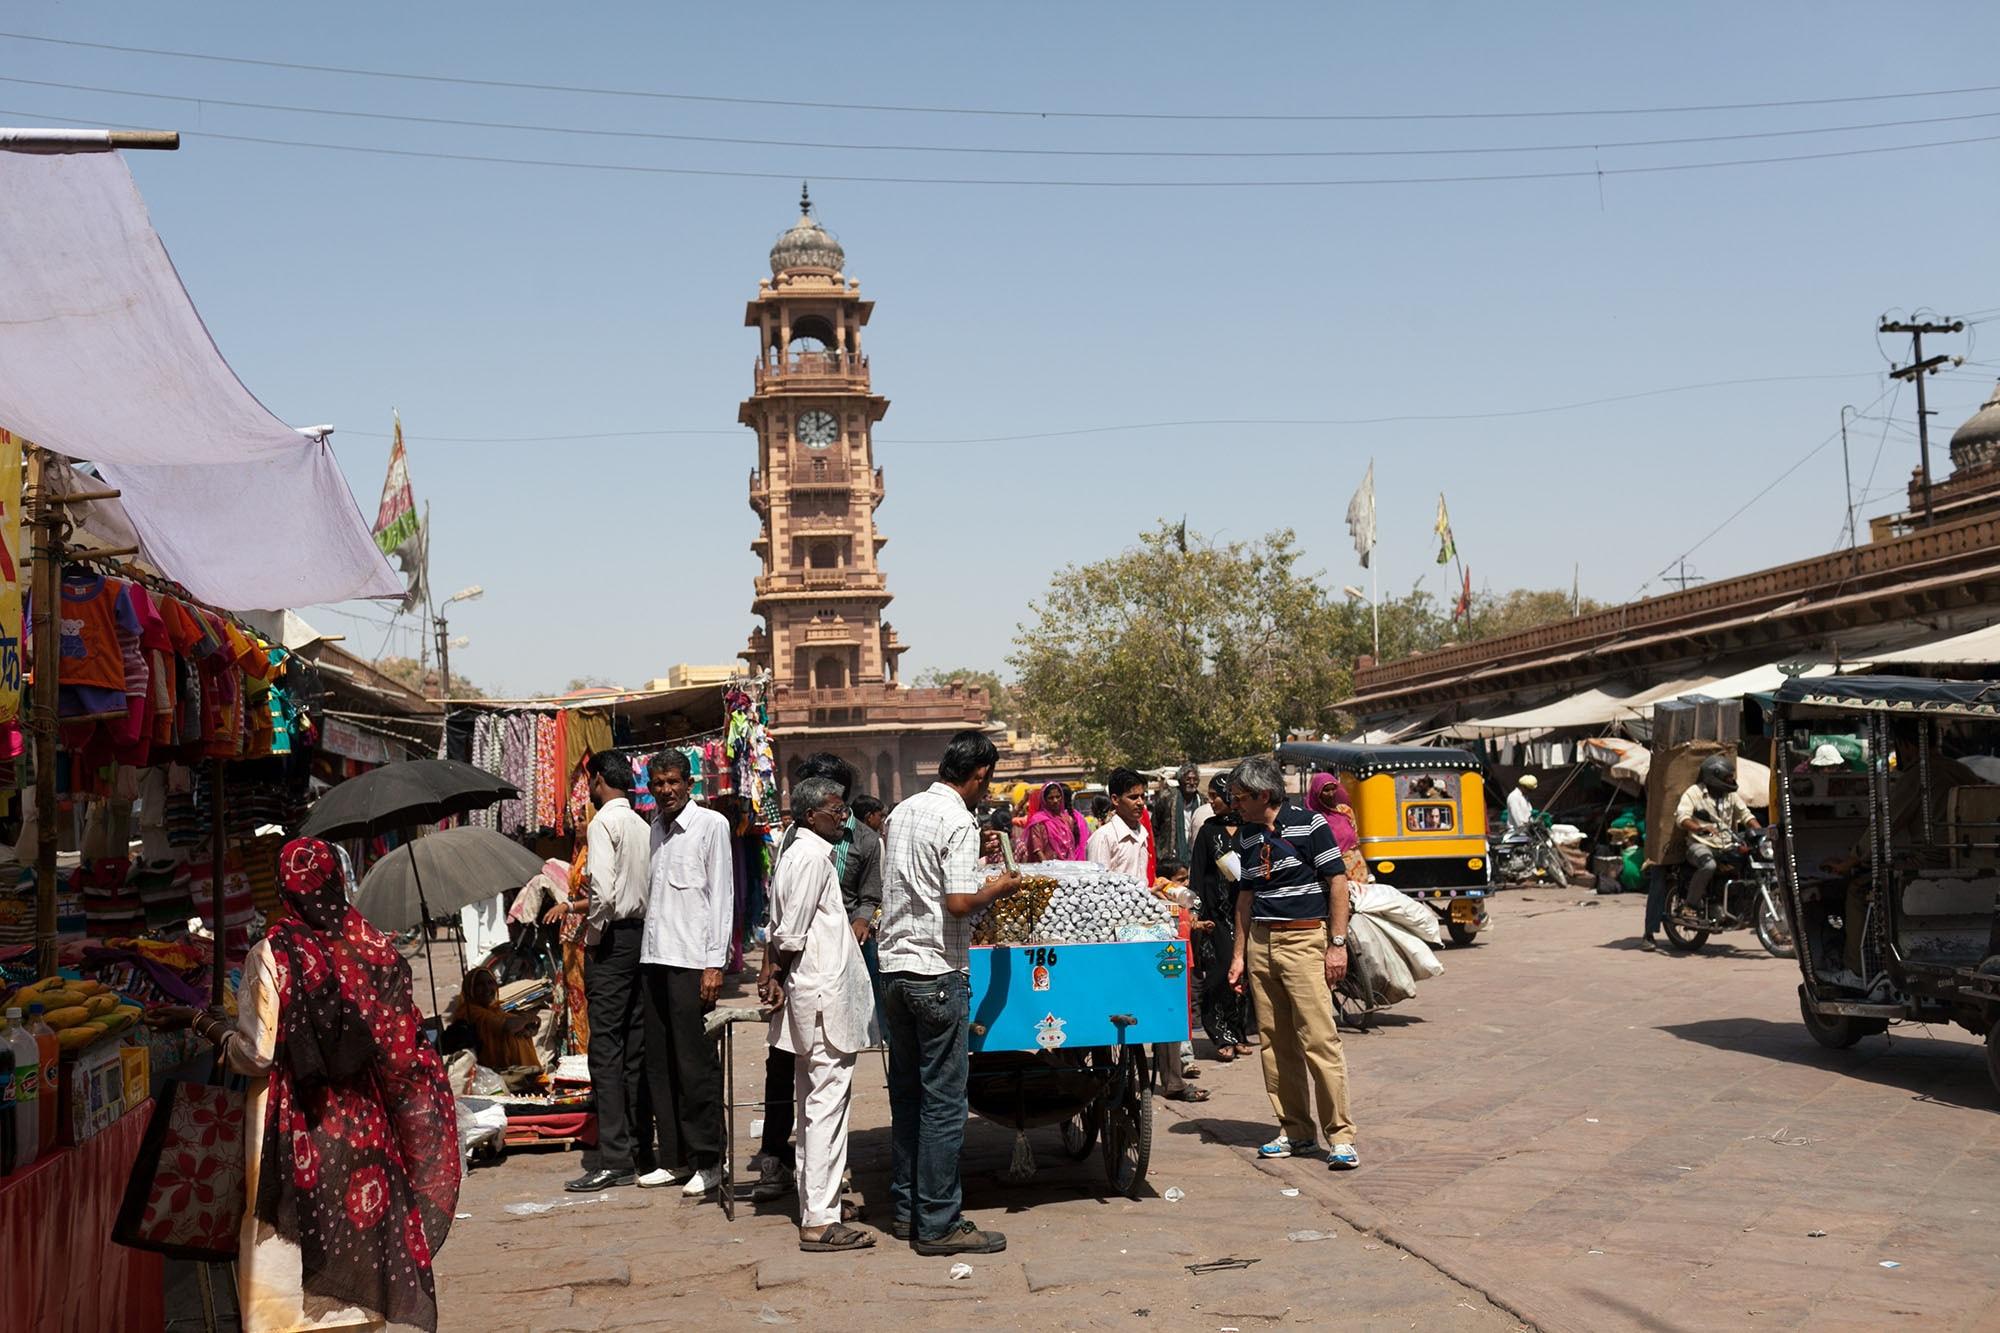 Market in Jodhpur, India.